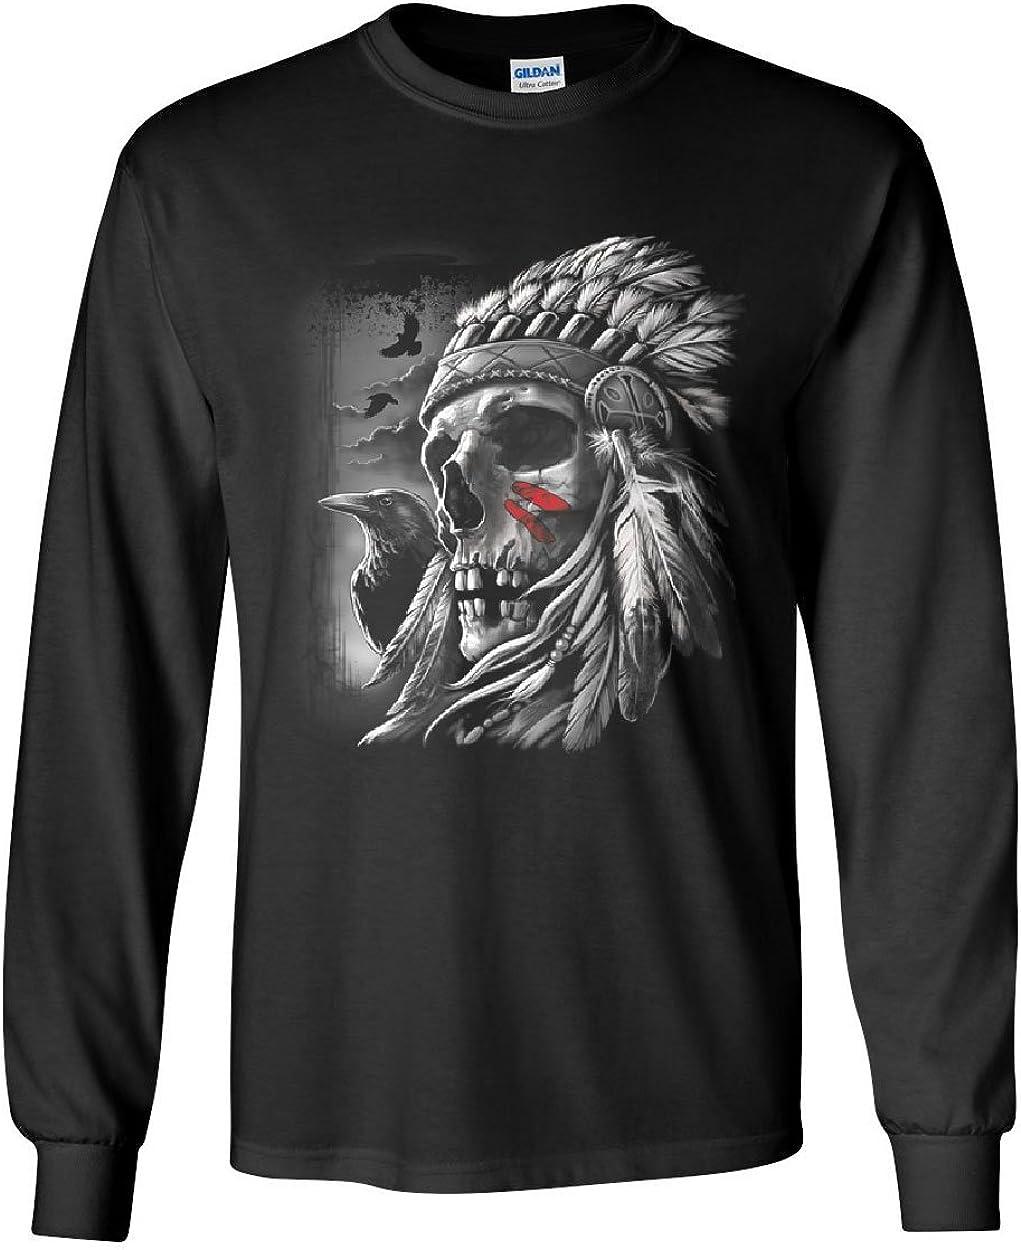 Indian Warbonnet Headdress Muscle Shirt Native American Tribal Chief Sleeveless